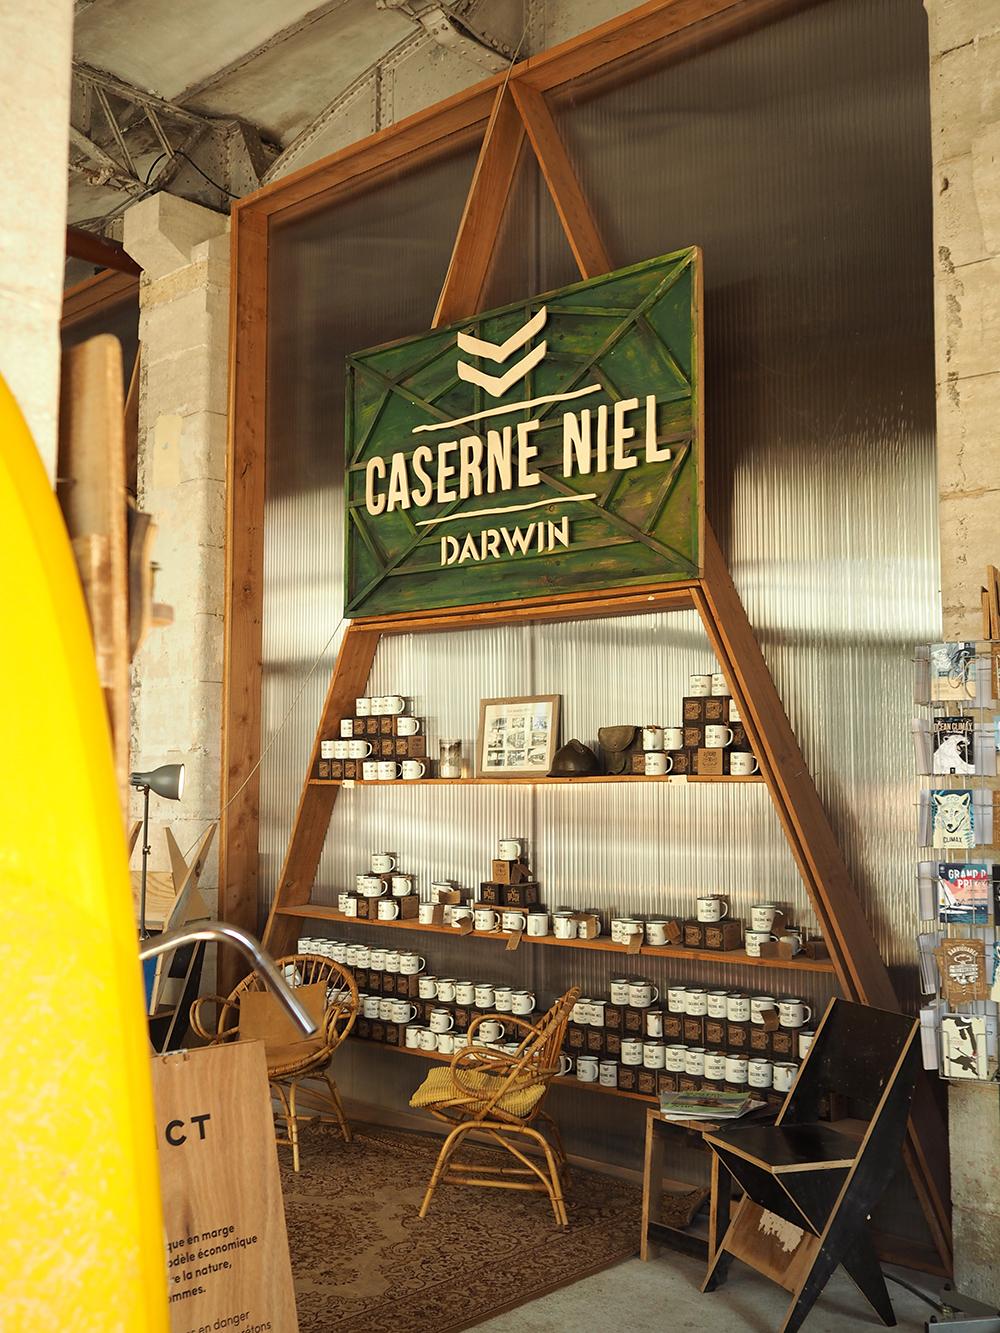 Caserne Niel, Darwin Eco-systeme, Bordeaux